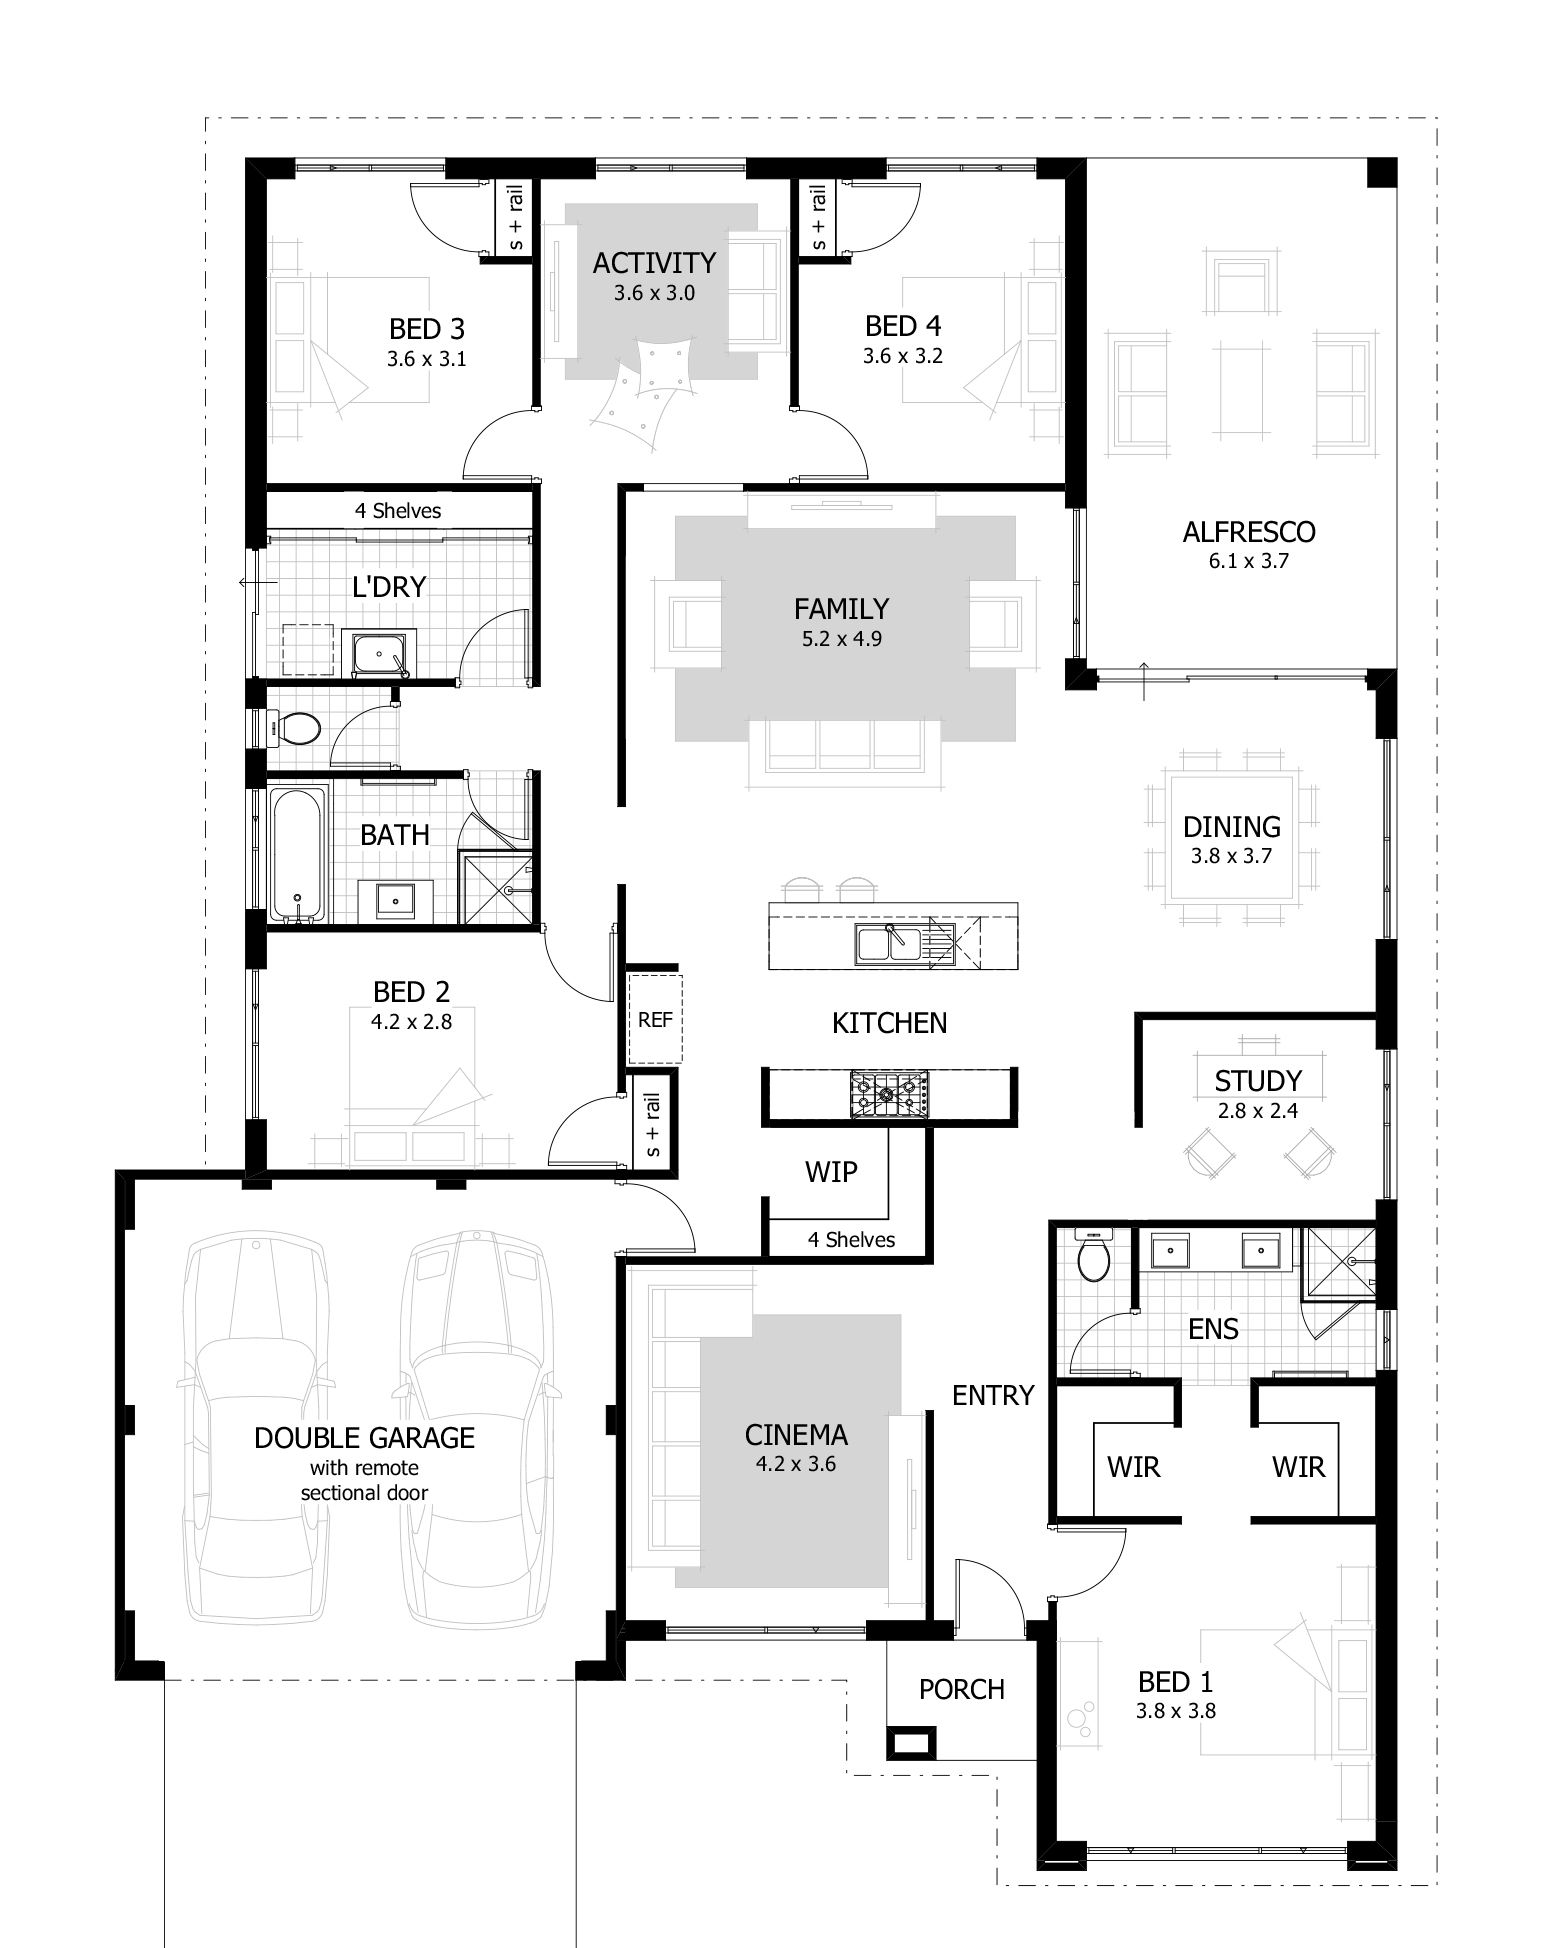 4 Bedroom House Plans Home Designs Celebration Homes House Floor Plans Bungalow Floor Plans 4 Bedroom House Plans